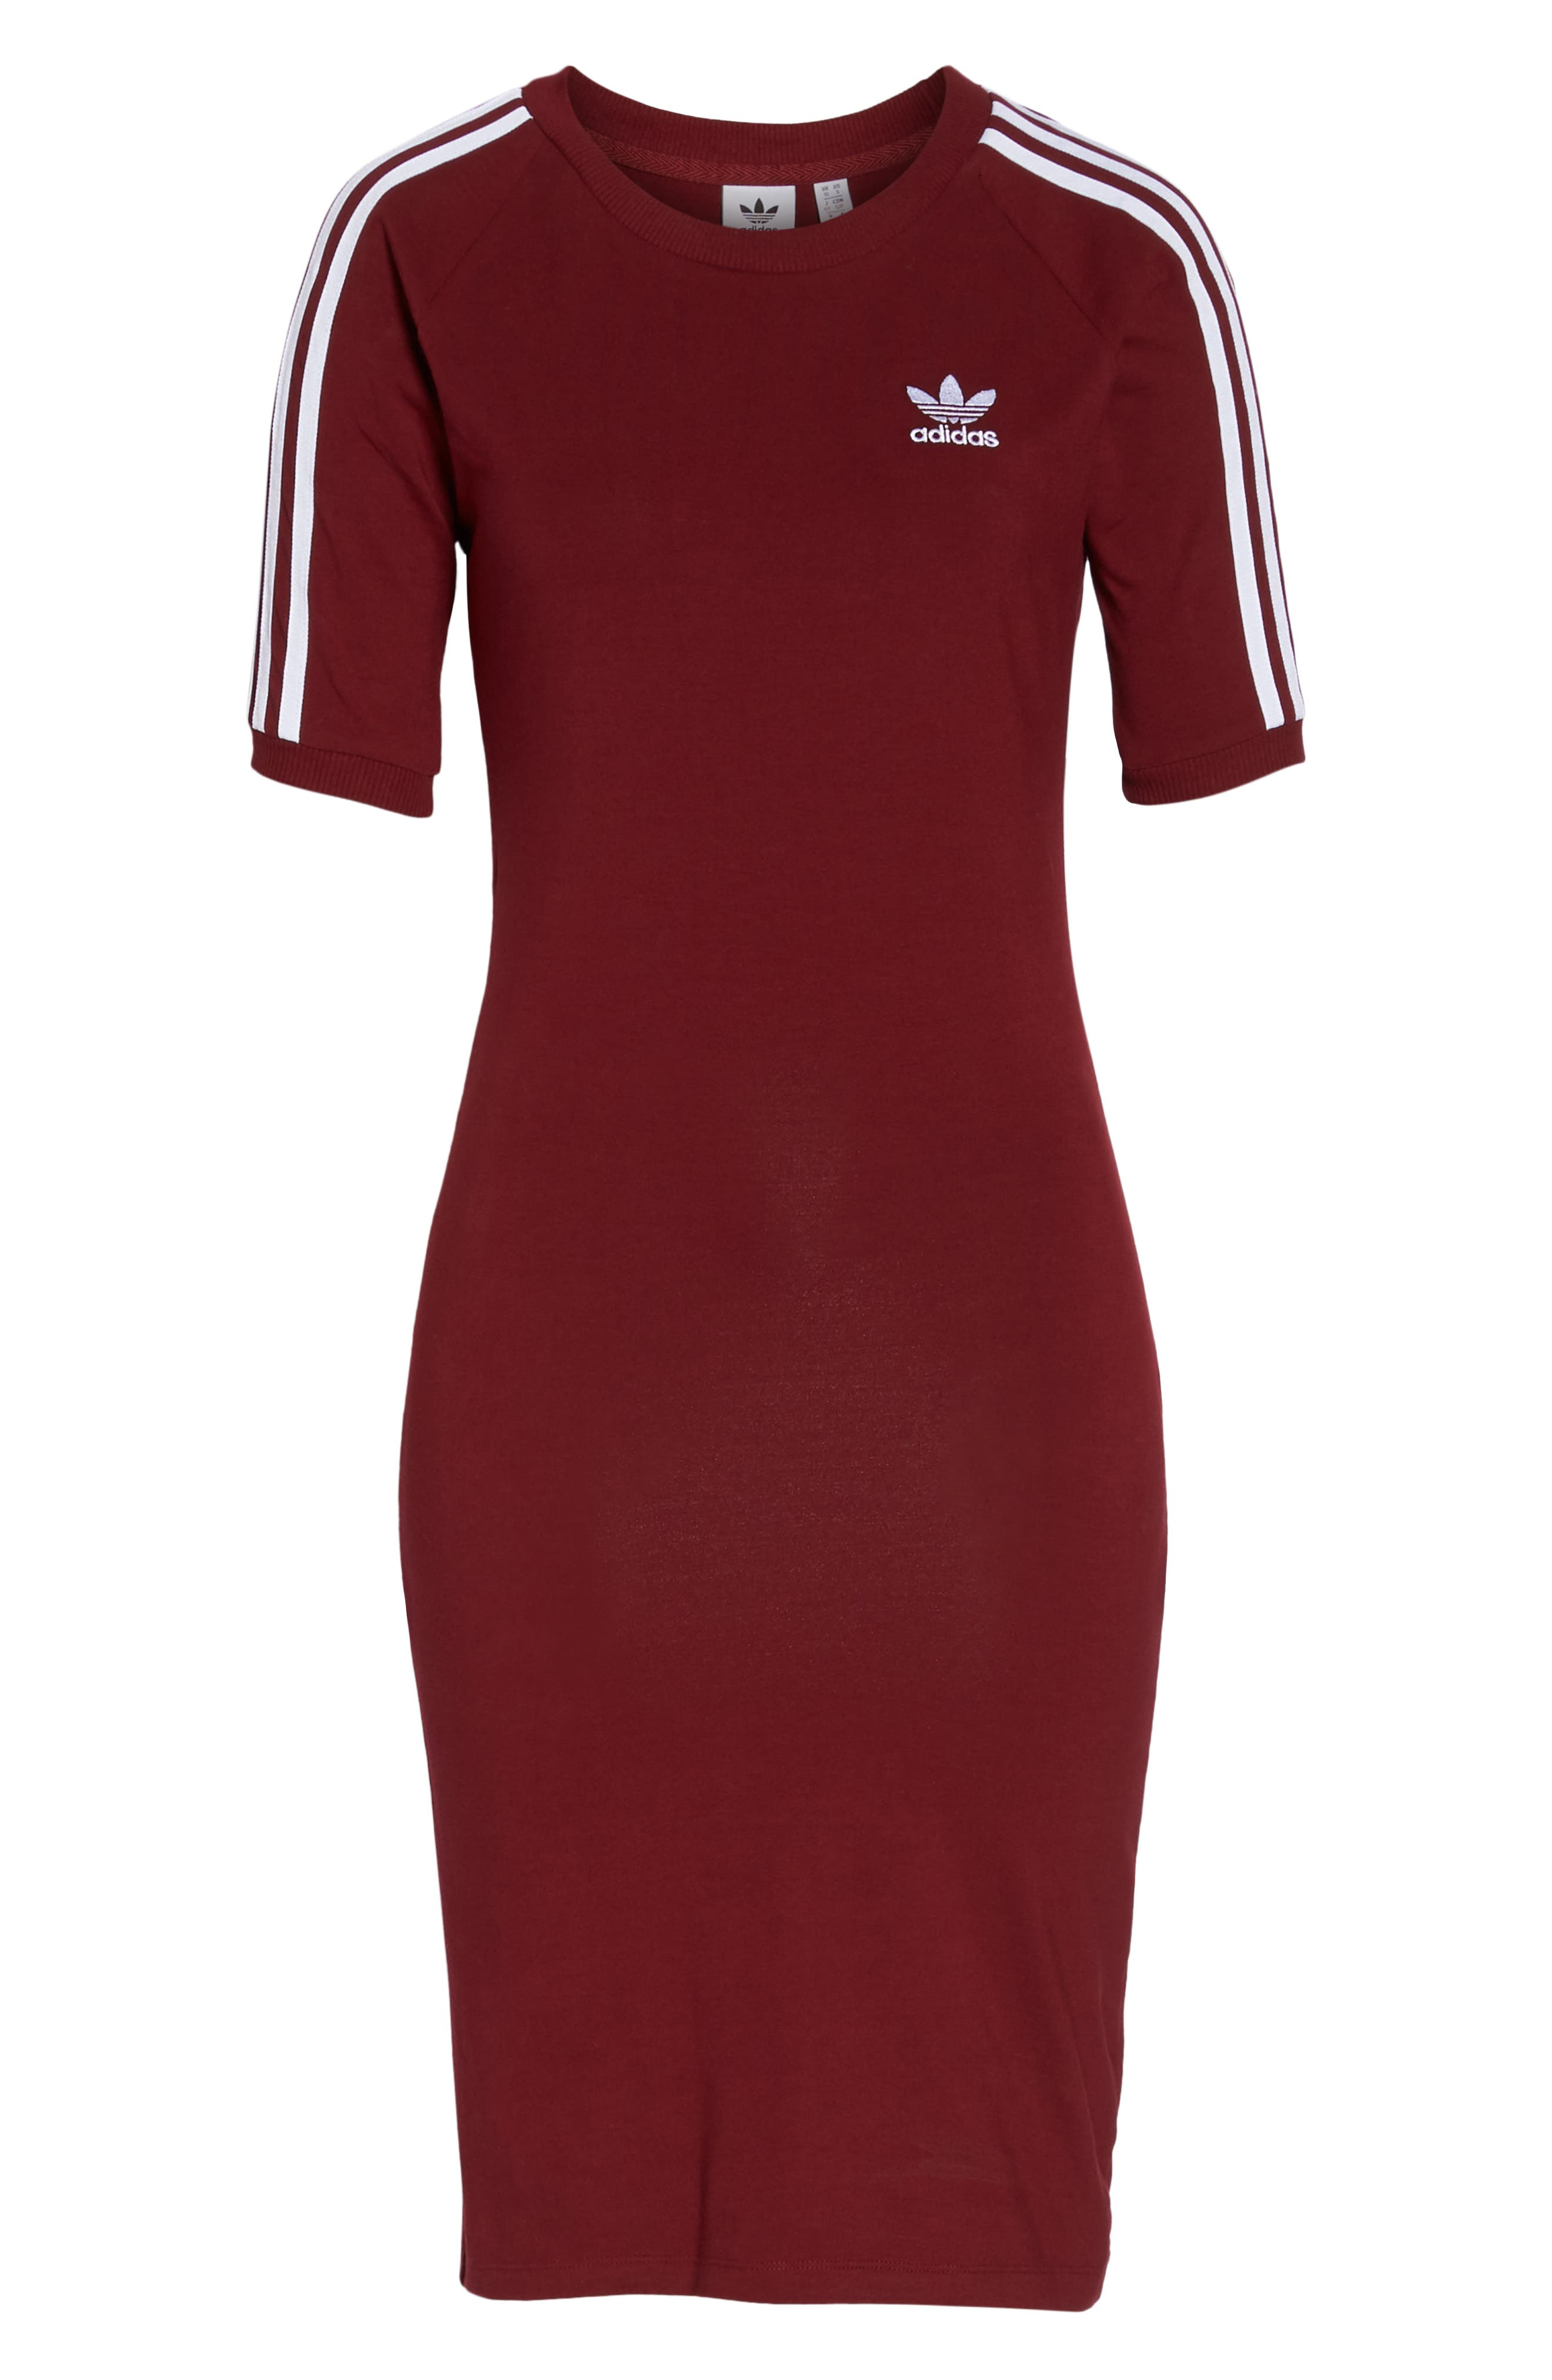 Originals 3-Stripes Dress,                             Alternate thumbnail 7, color,                             Collegiate Burgundy